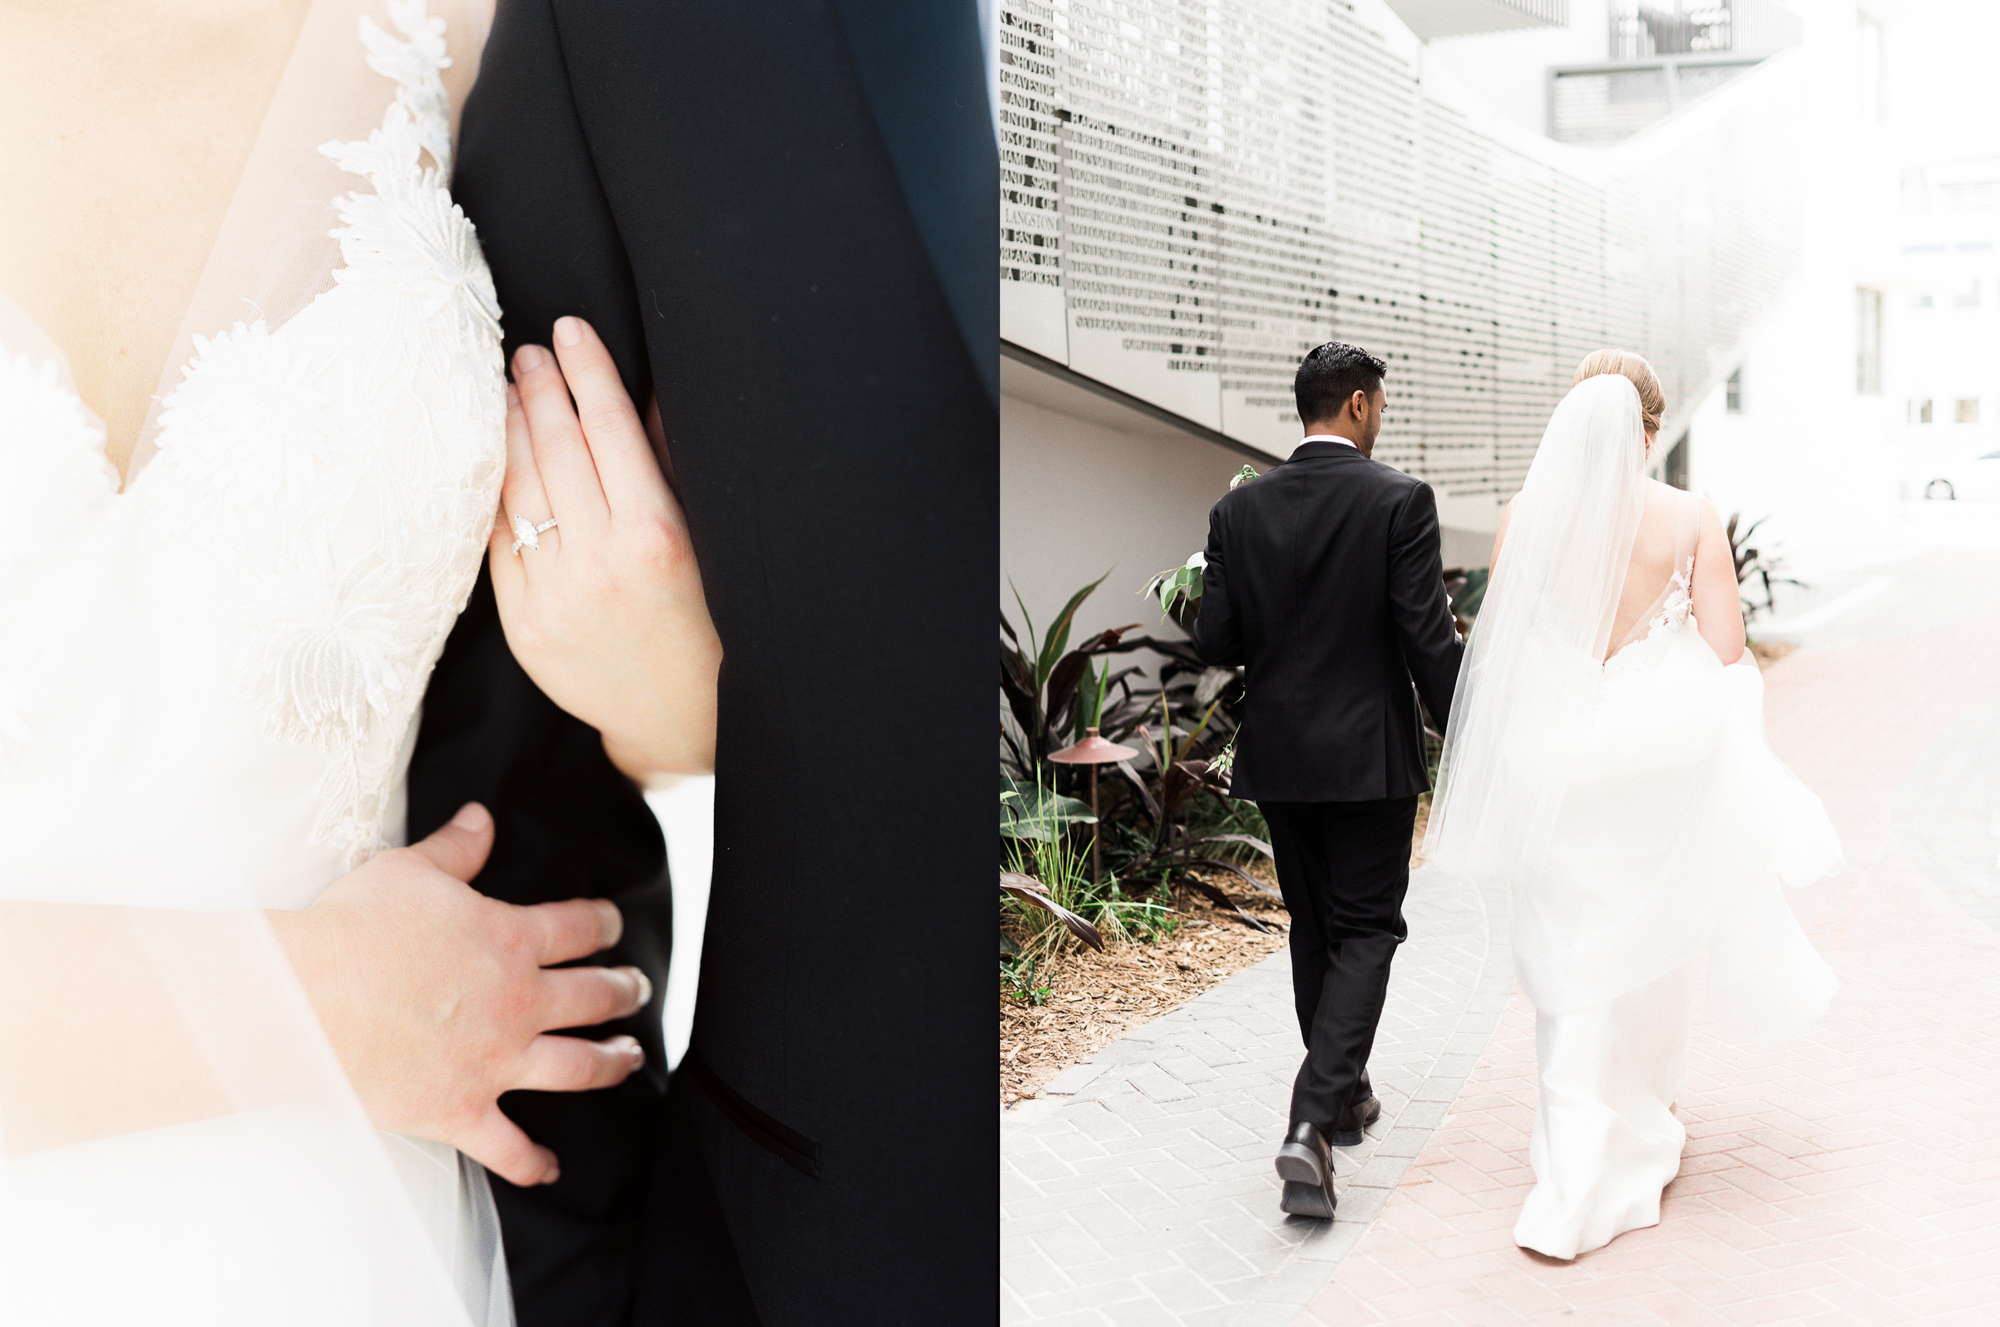 betsy-hotel-wedding-south-beach-miami-charleston-south-carolina-destination-wedding-photographer-11.jpg